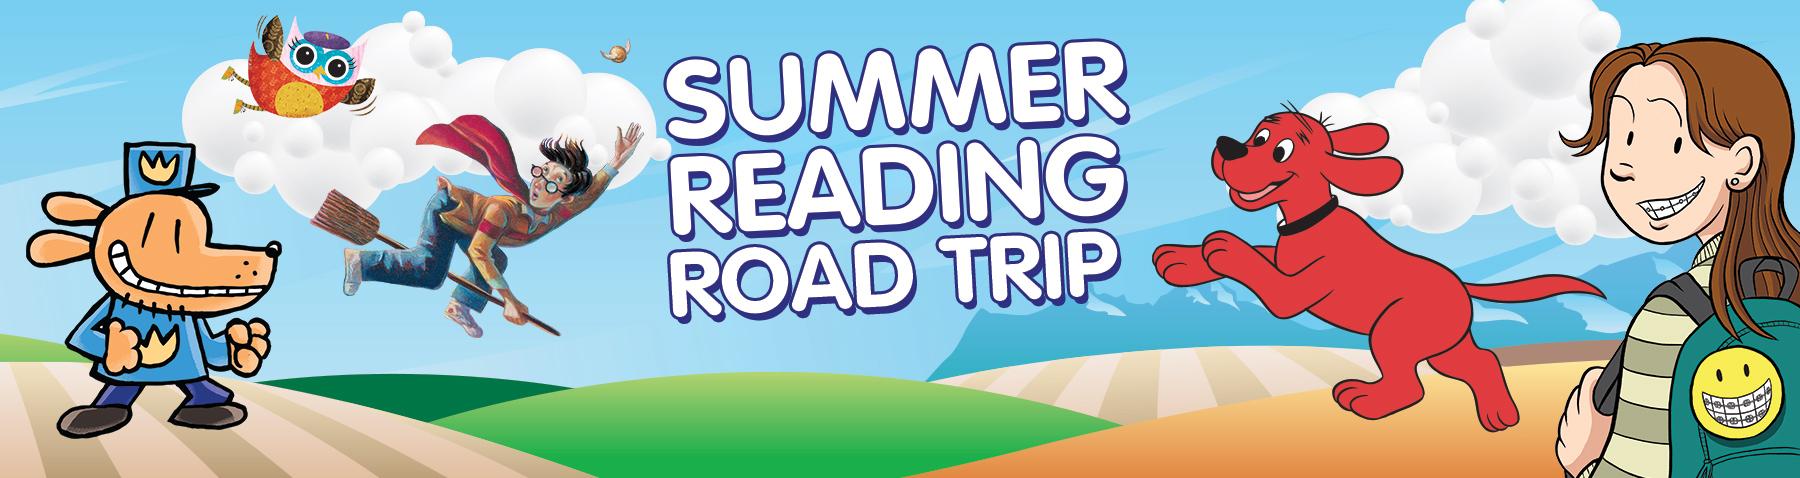 header_summer-reading-roadtrip2.jpg